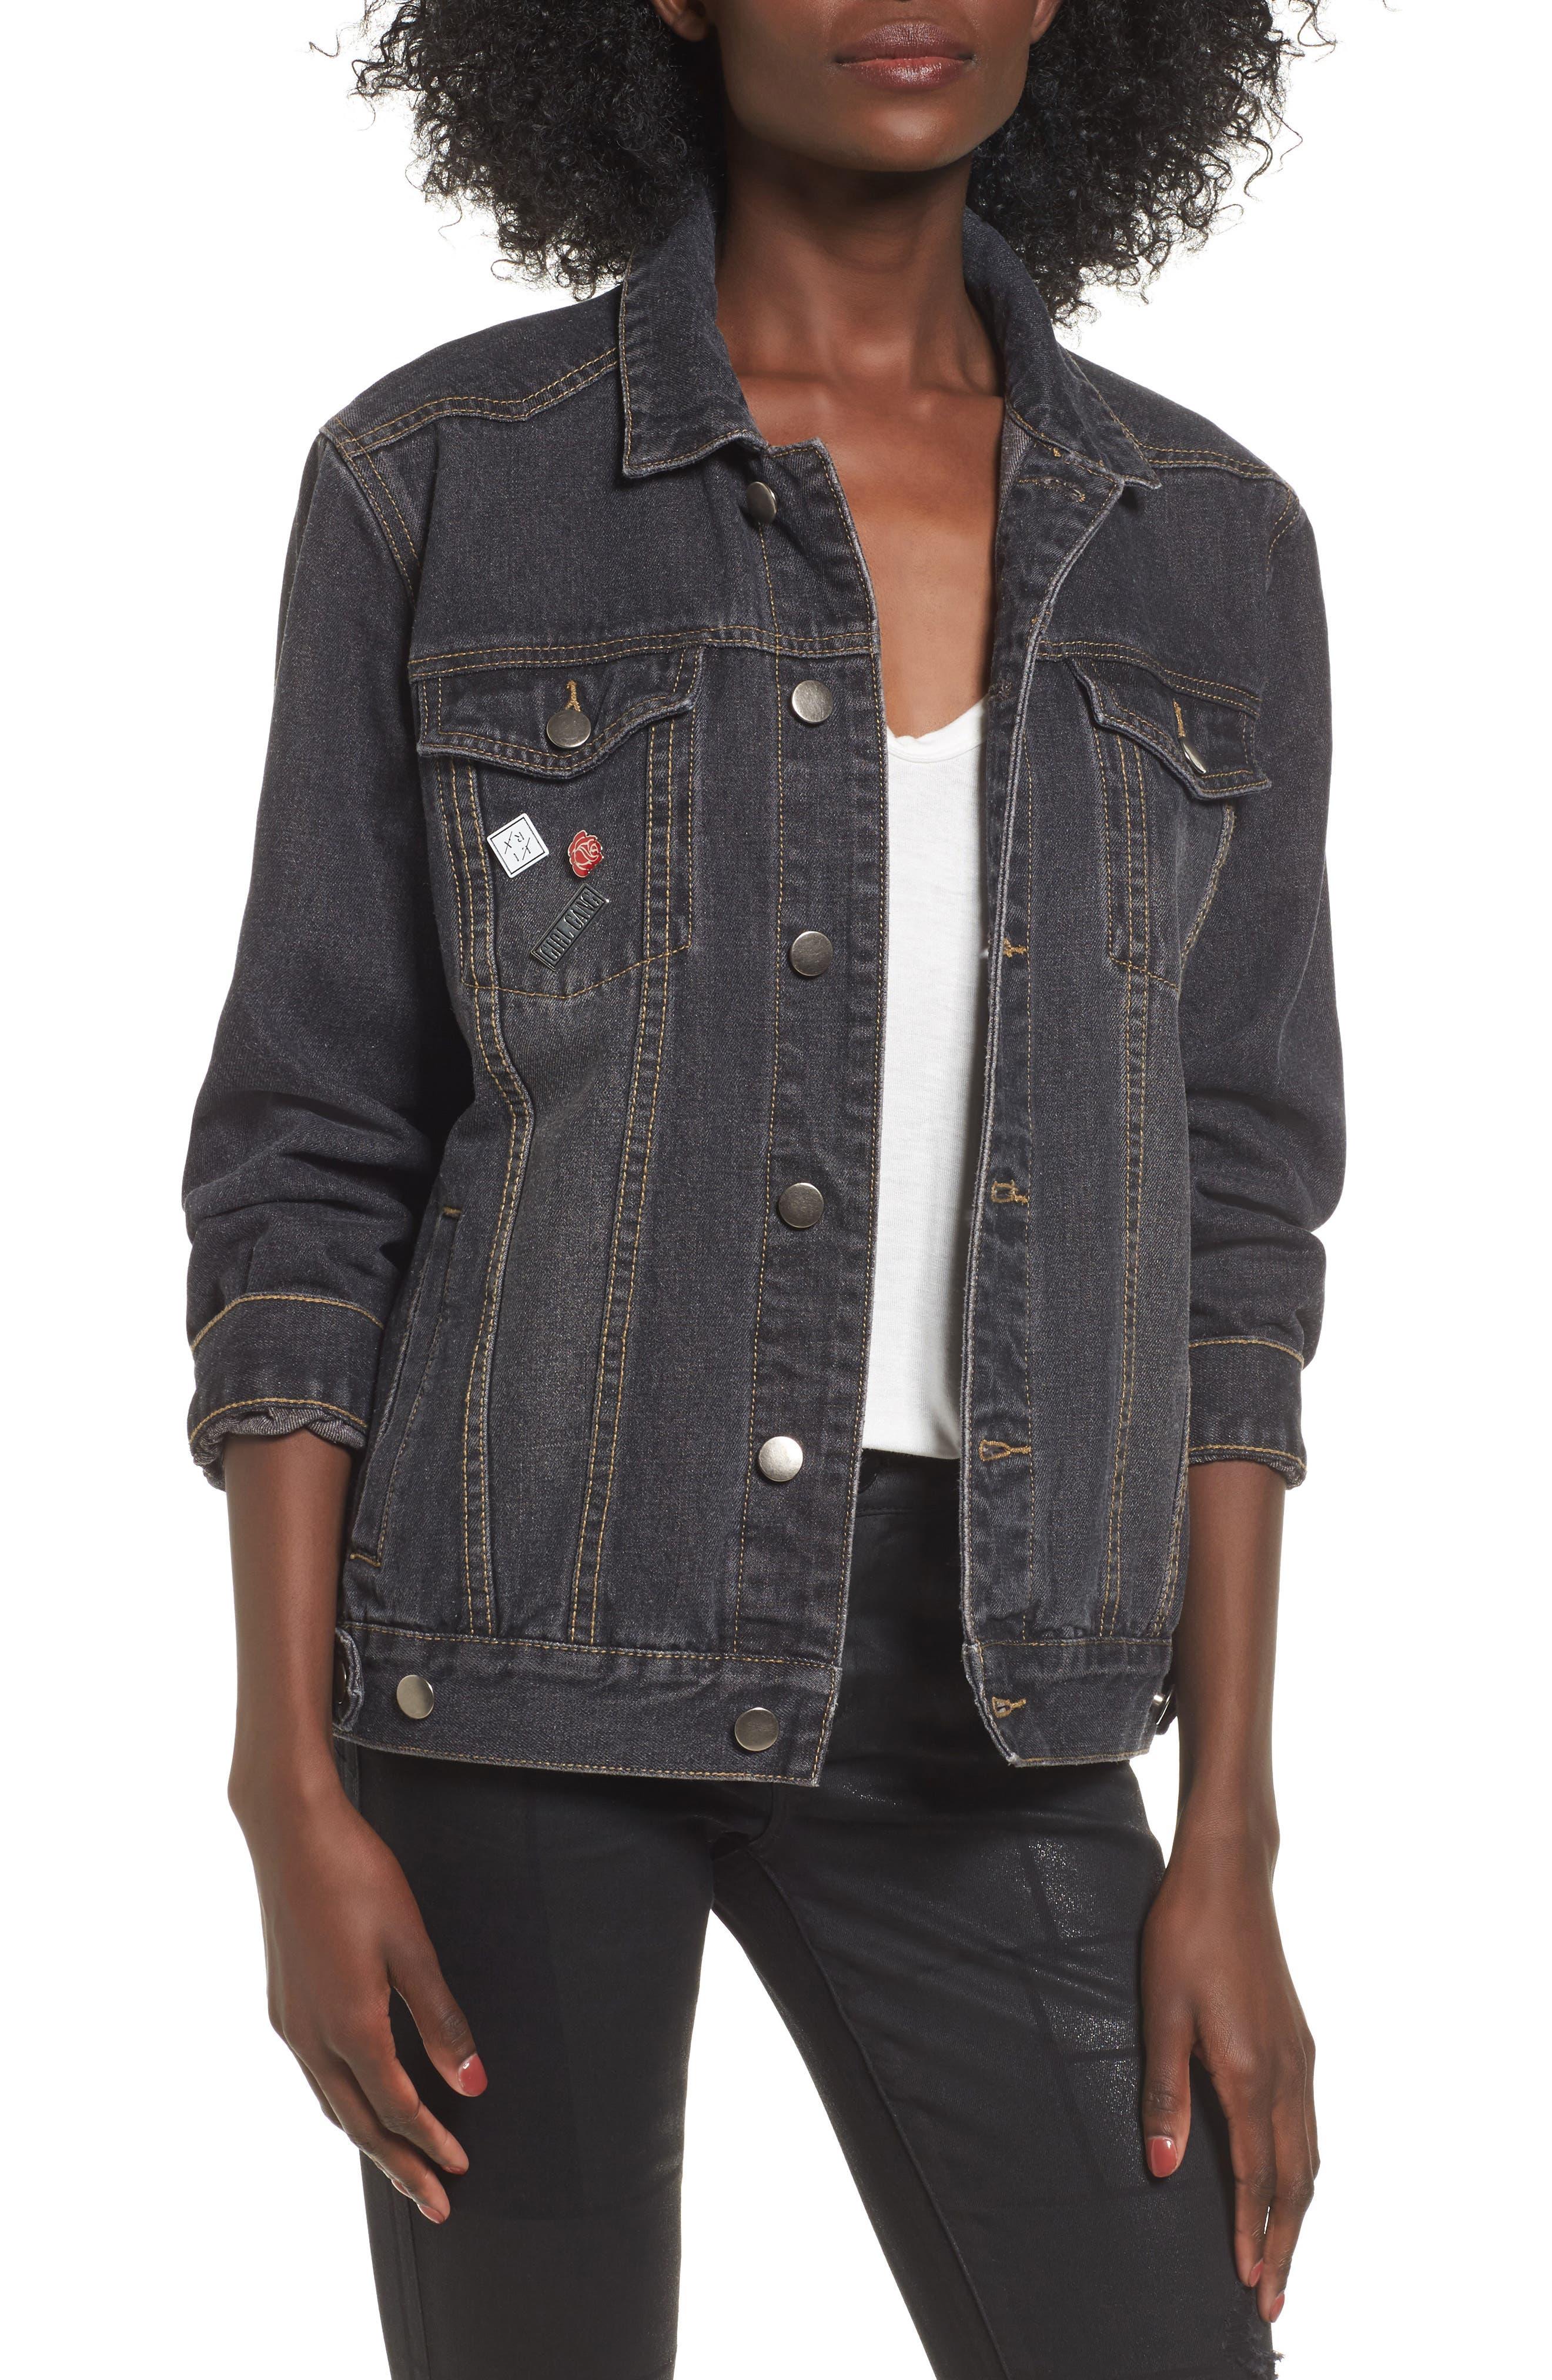 Alternate Image 1 Selected - Lira Clothing Girl Gang Denim Jacket